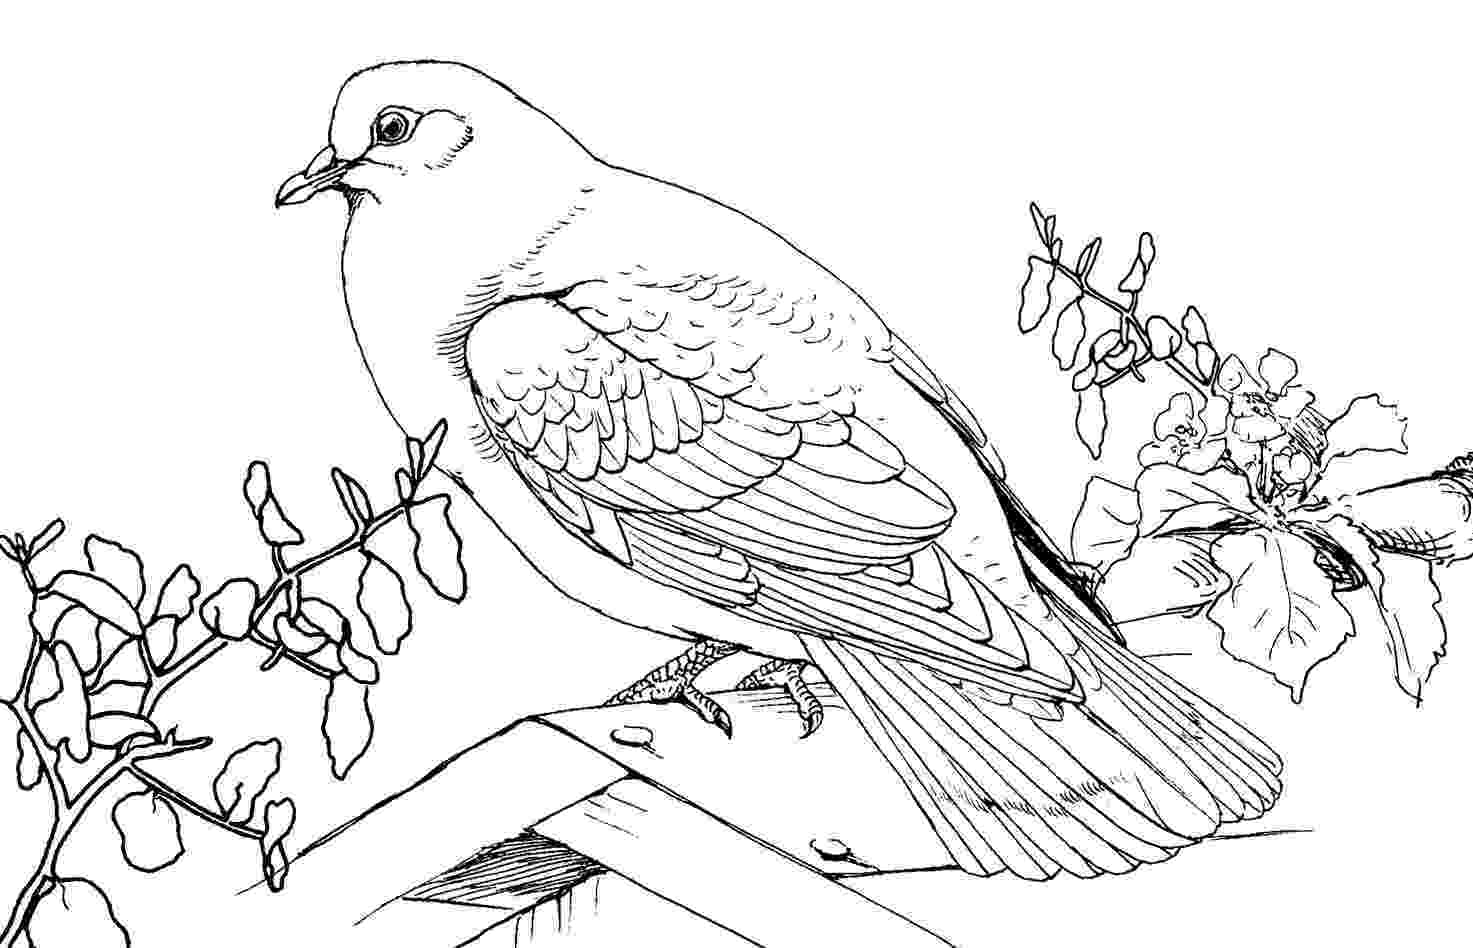 pigeon coloring sheet rock pigeon coloring page free printable coloring pages sheet pigeon coloring